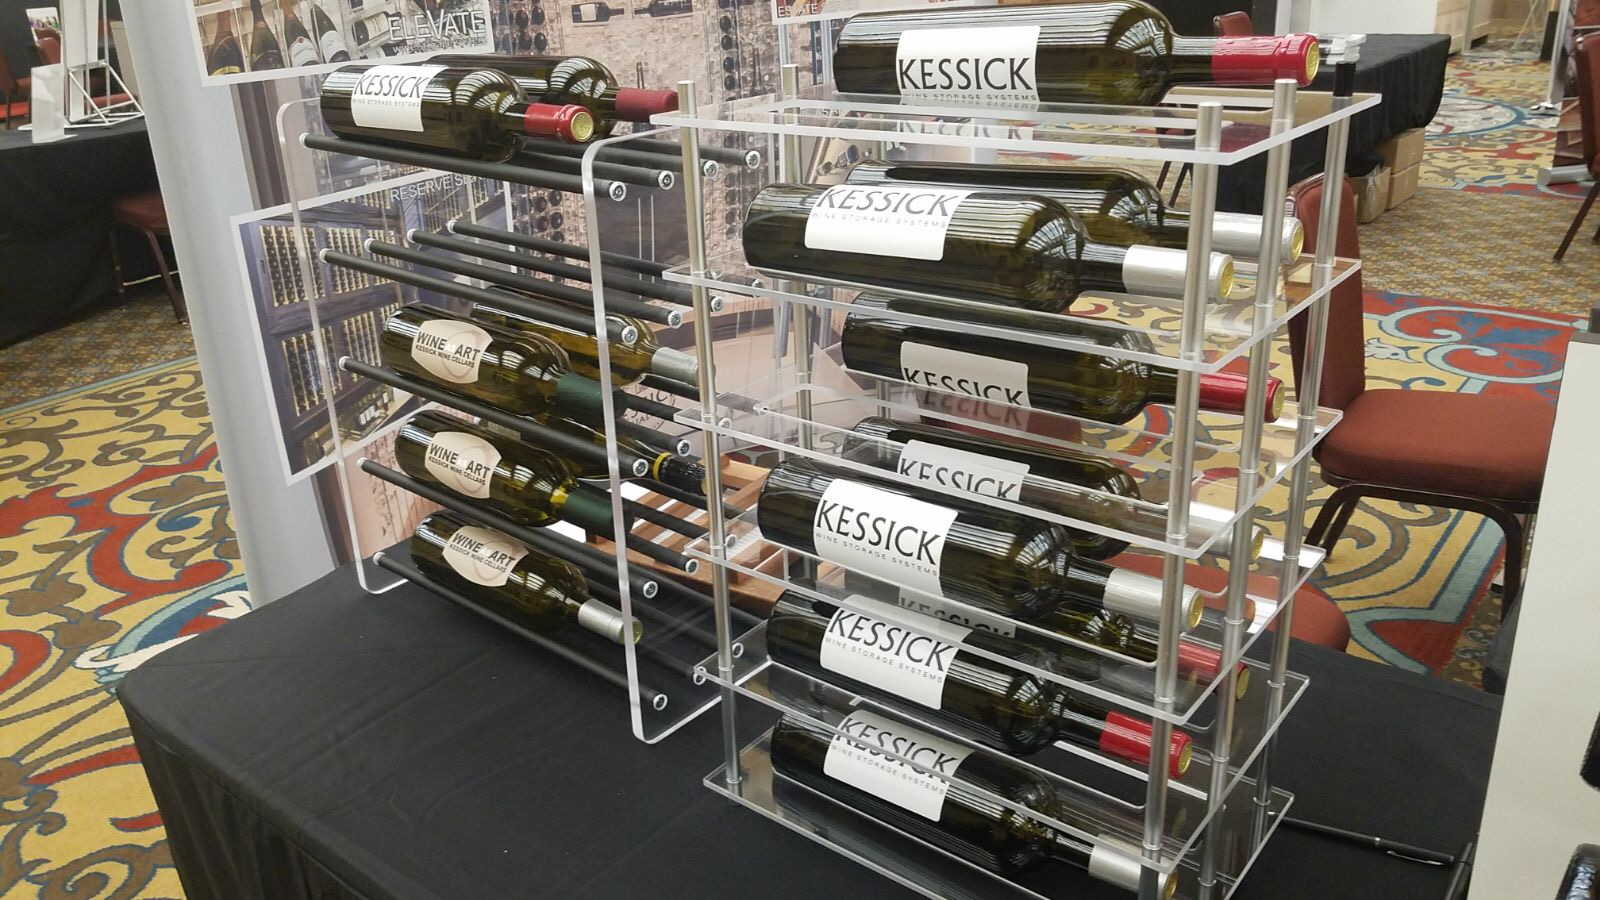 Kessick Wine Cellars display at SEN Design Group Fall 2017 Conference